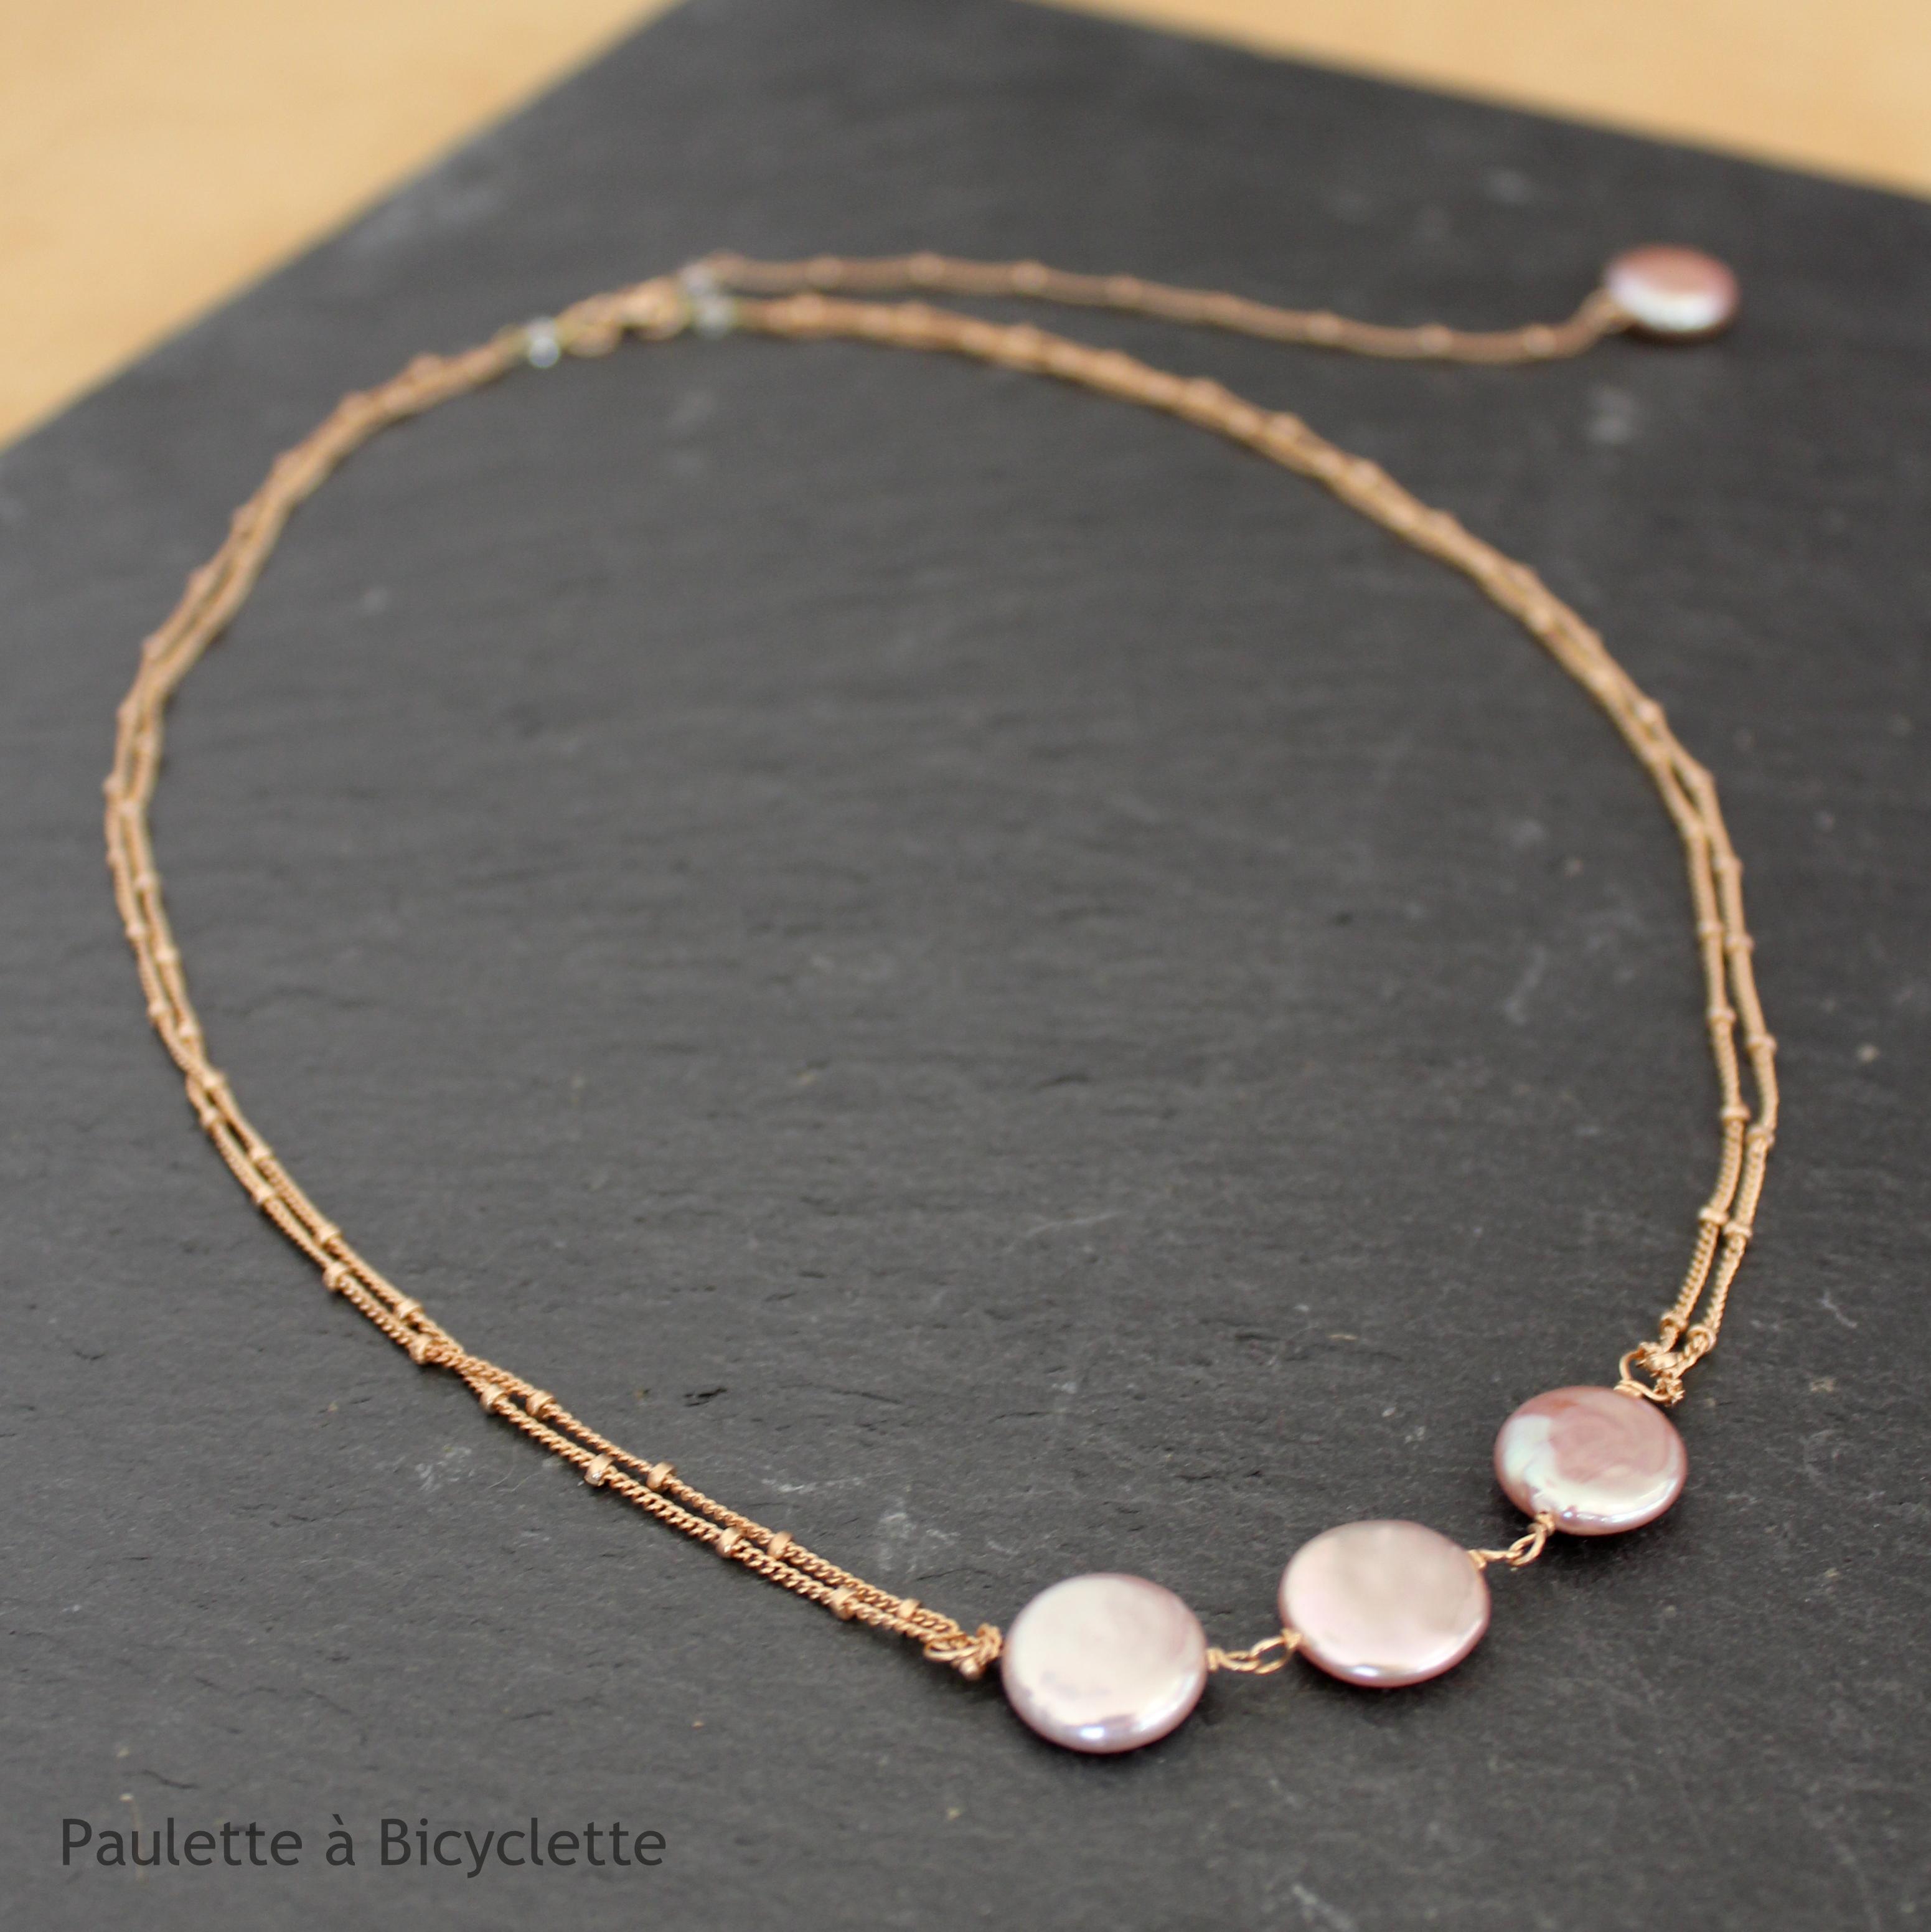 bijoux-mariage-dos-collier-mariee-perles-culture-rose-poudre